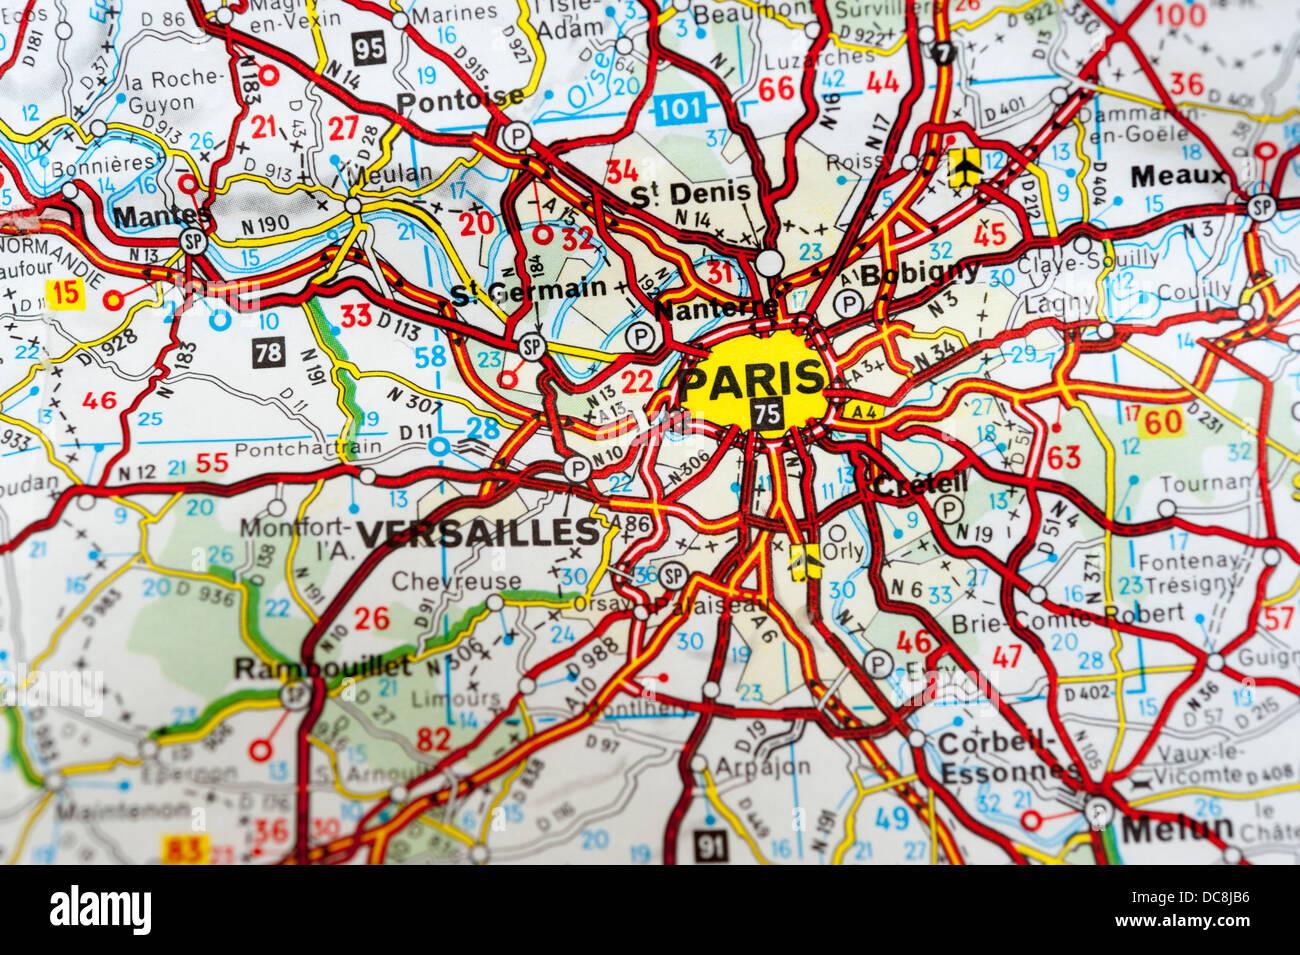 Map Of Paris And Surrounding Areas Close Up Stock Photo Royalty - Paris road map